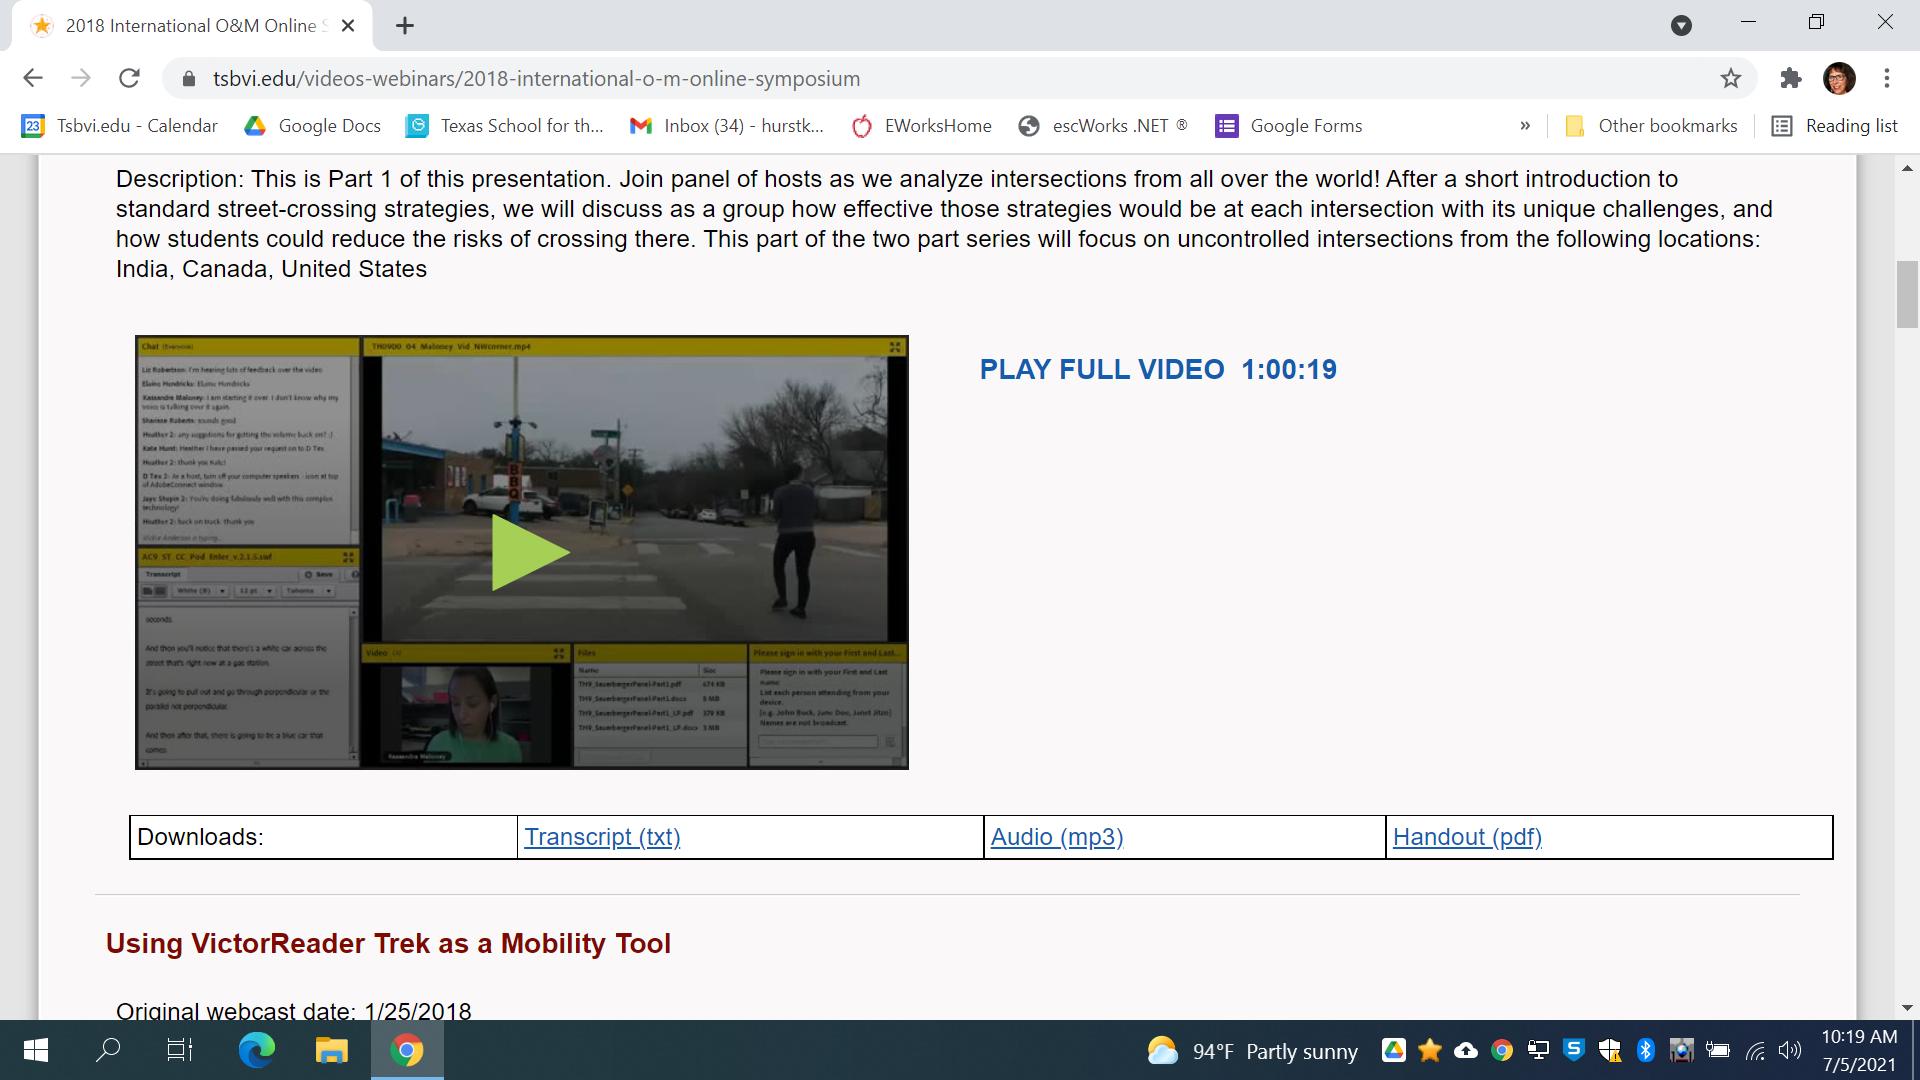 Screenshot of recorded presentations on TSBVI website.